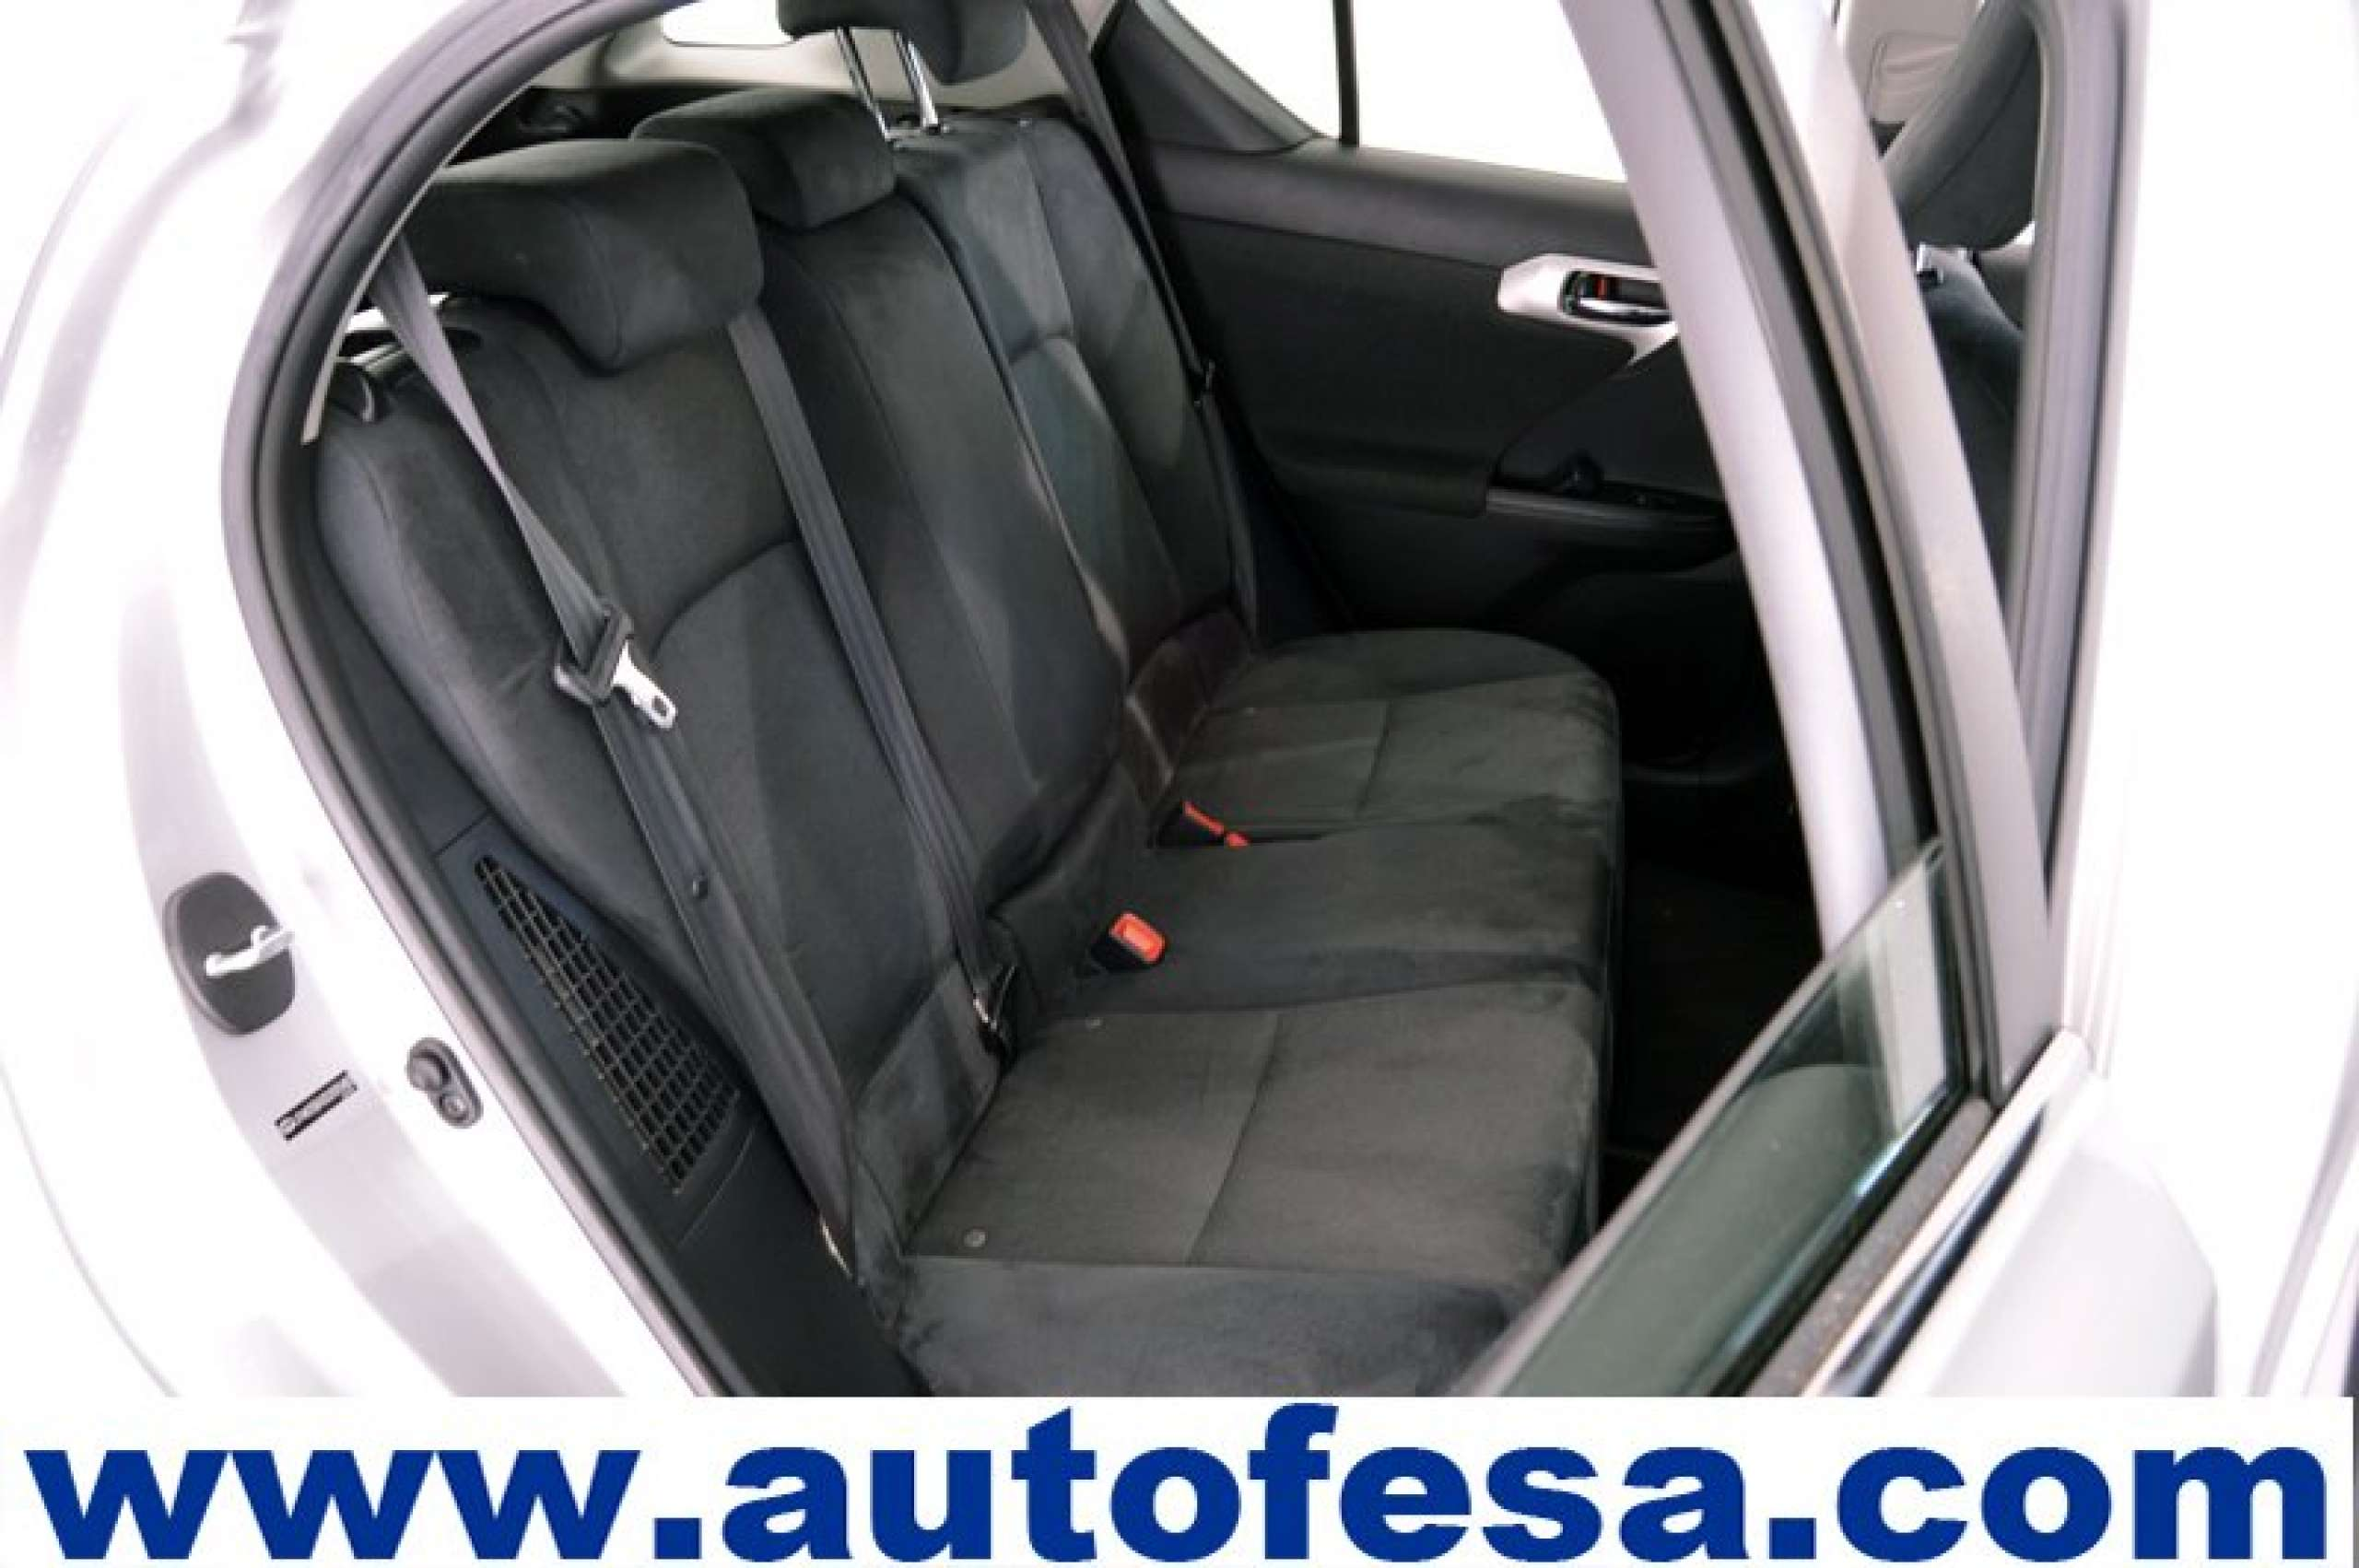 Lexus Ct 200h 1.8 136cv Eco Auto 5p - Foto 32